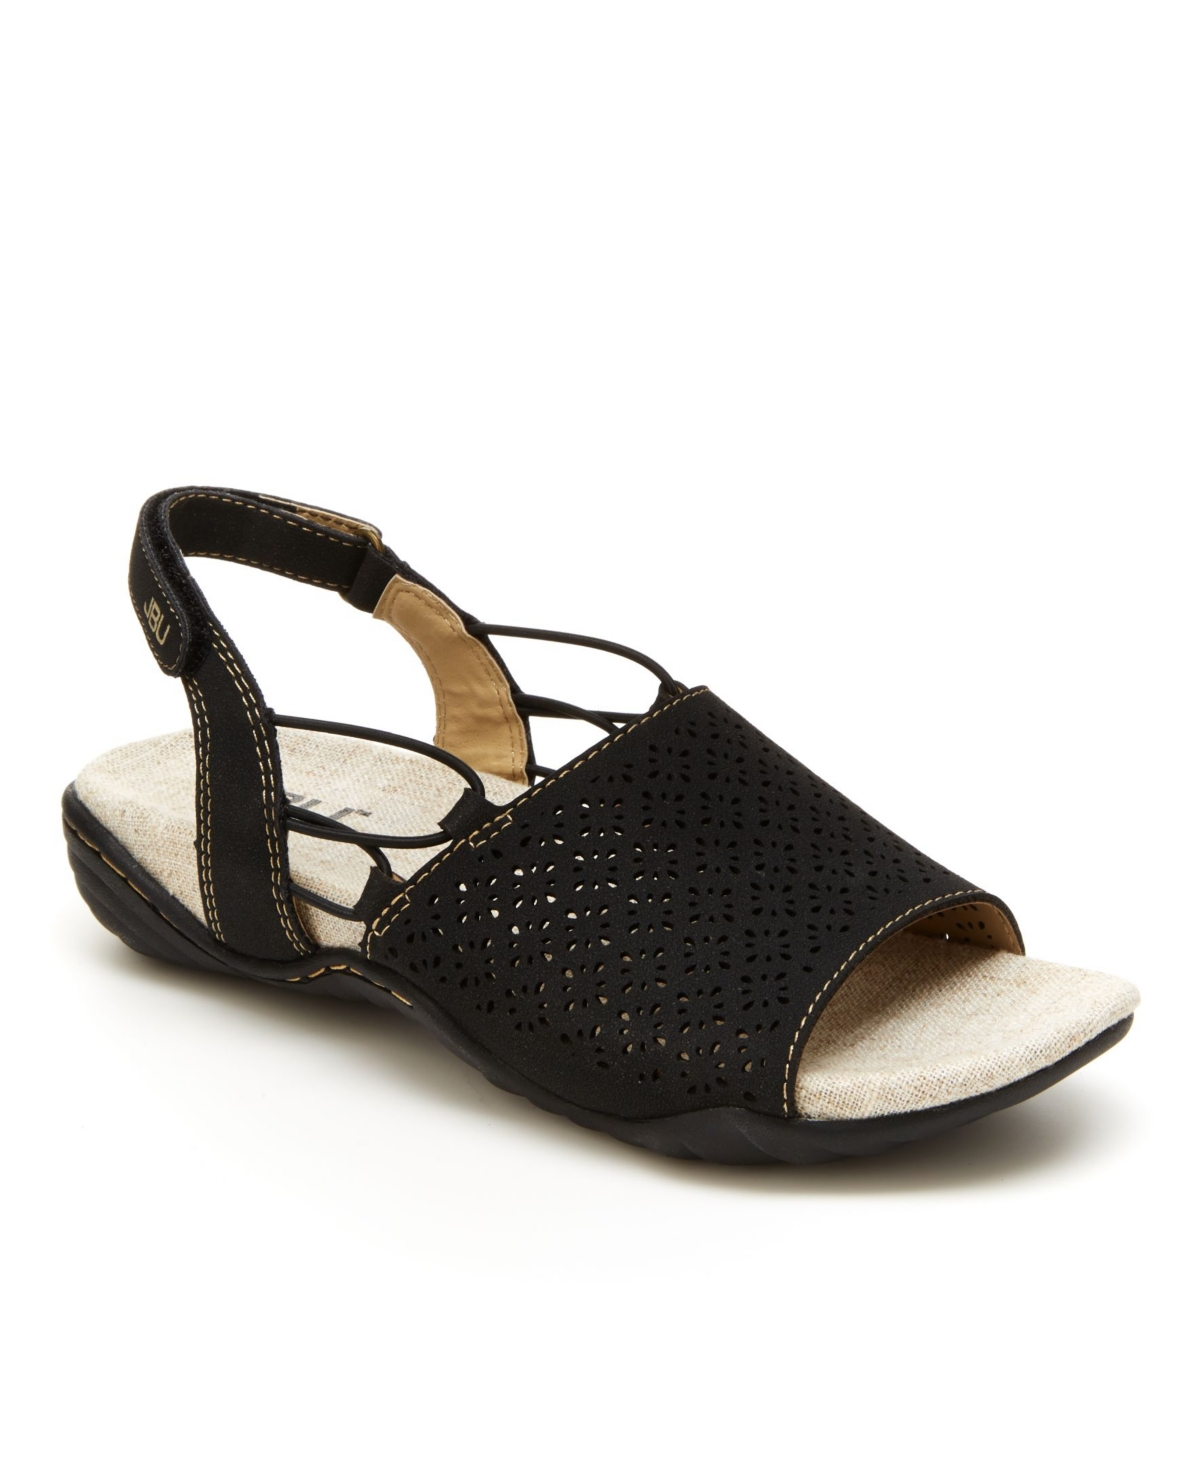 Women's Pixie Vegan Casual Sandal Women's Shoes